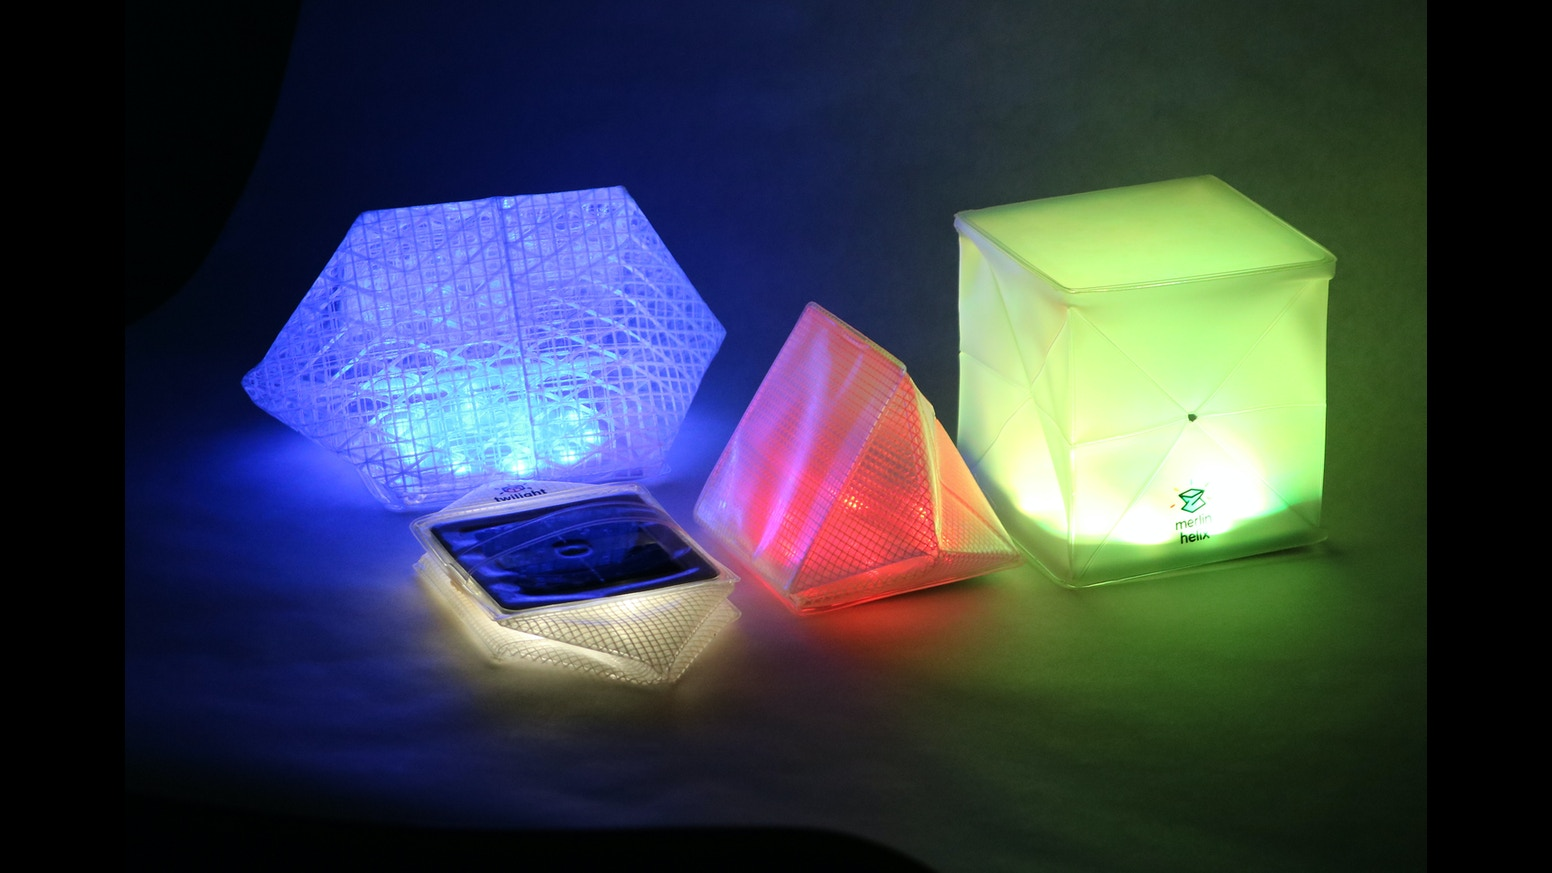 Led night light kickstarter - The Unique New Solarpuff Solar Light